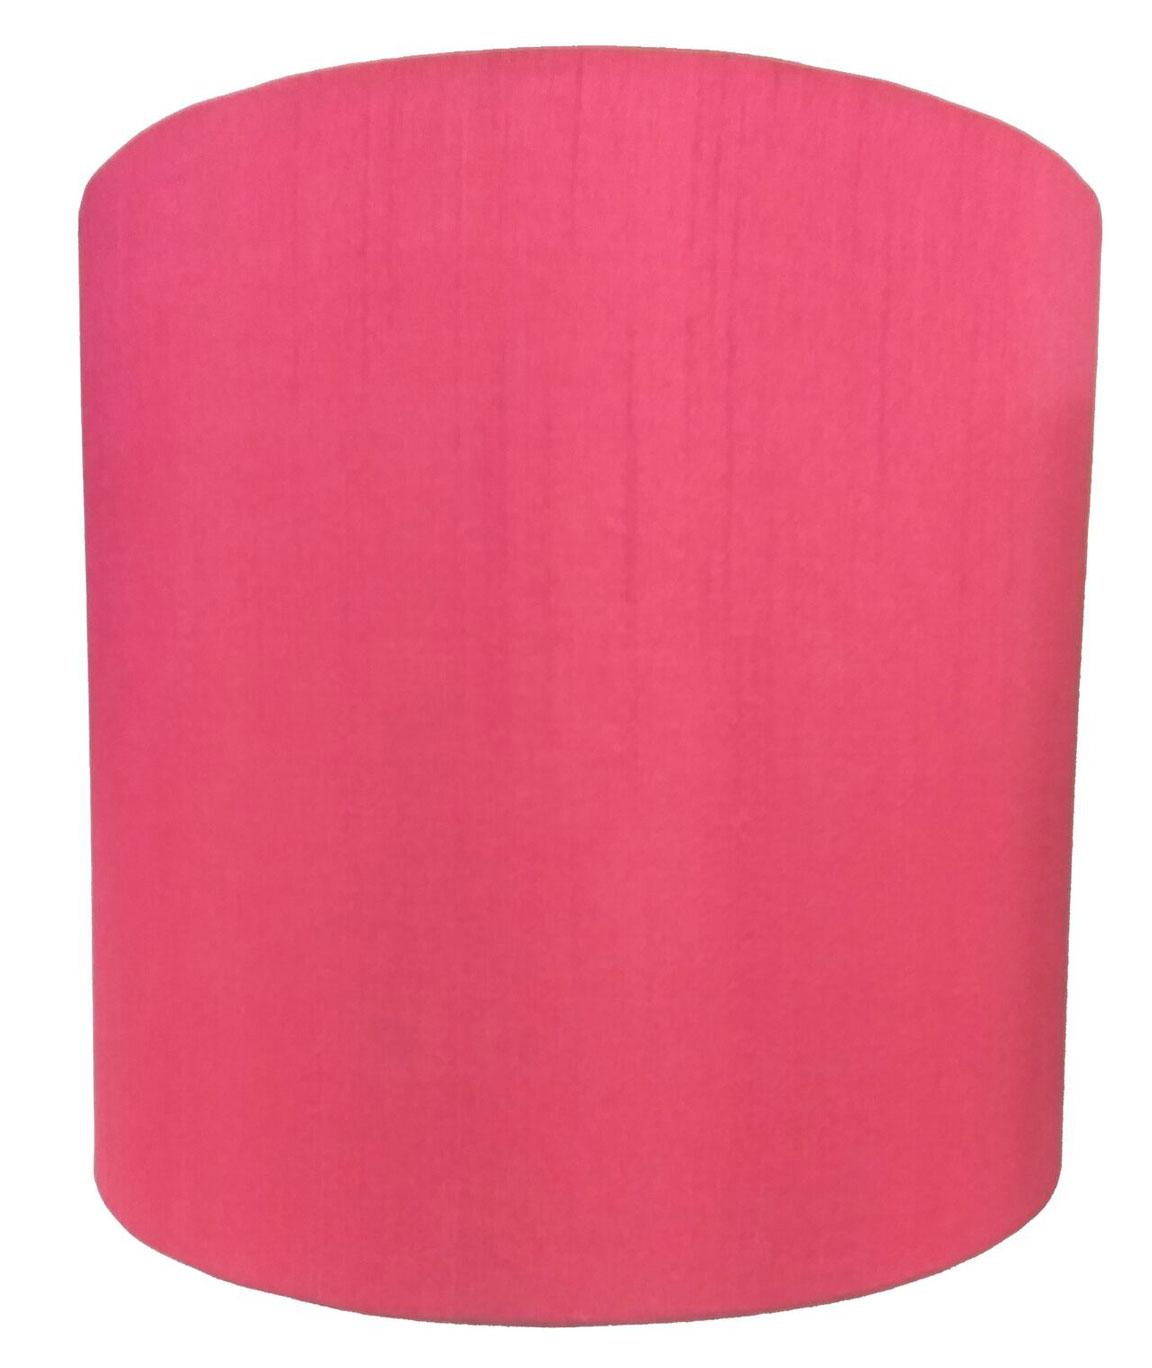 RDC 23 CMS Plain Rani Pink Half-Cylindrical Wall Hanging Lamp Shade